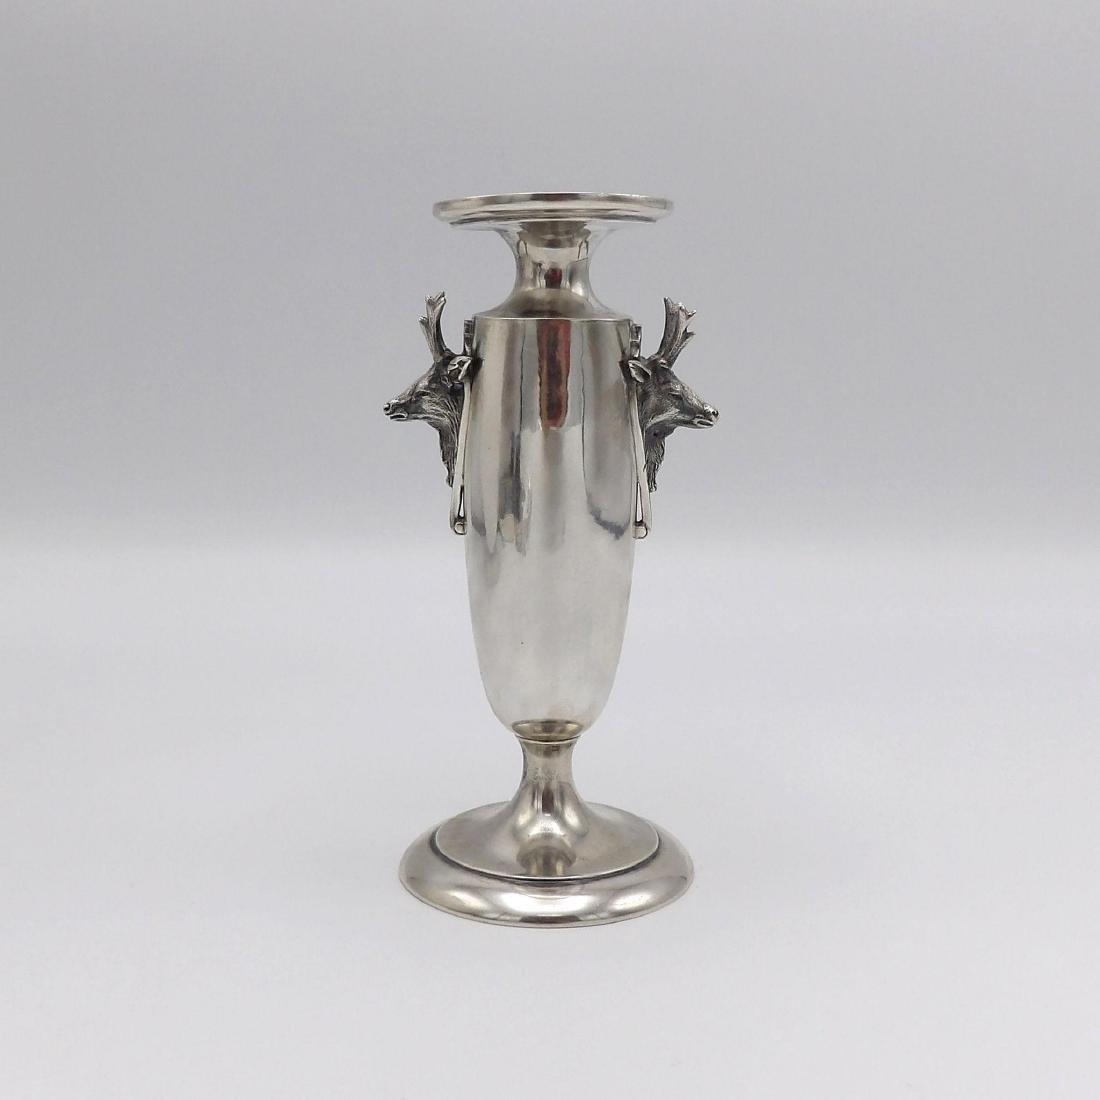 Antique Gorham Saxon Stag Sterling Silver Bud Vase 1860